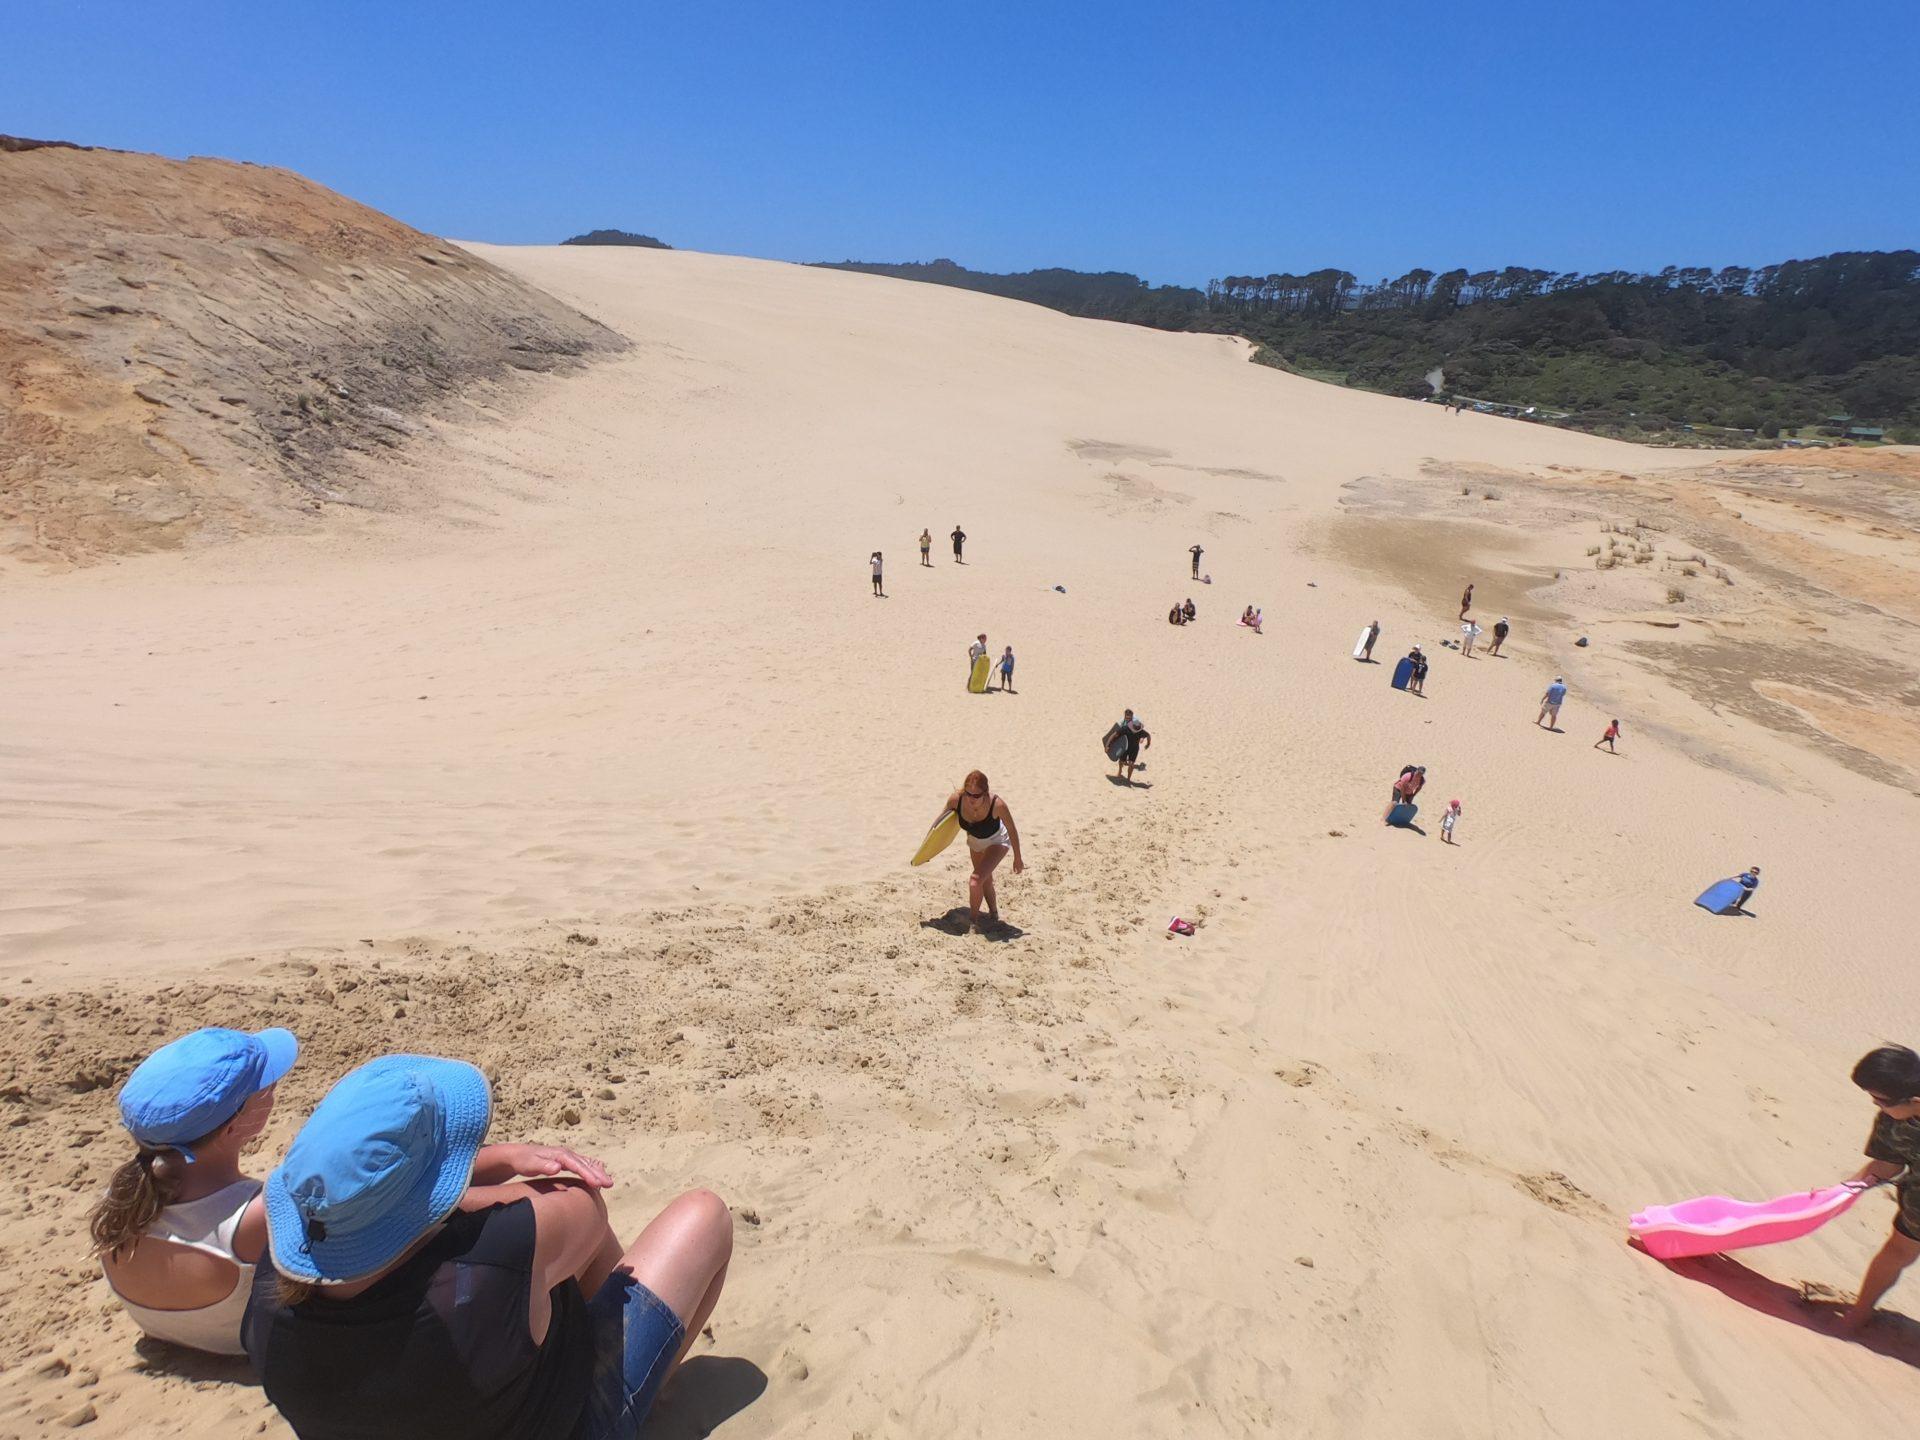 Sandboarding the Te Paki Sand Dunes of New Zealand